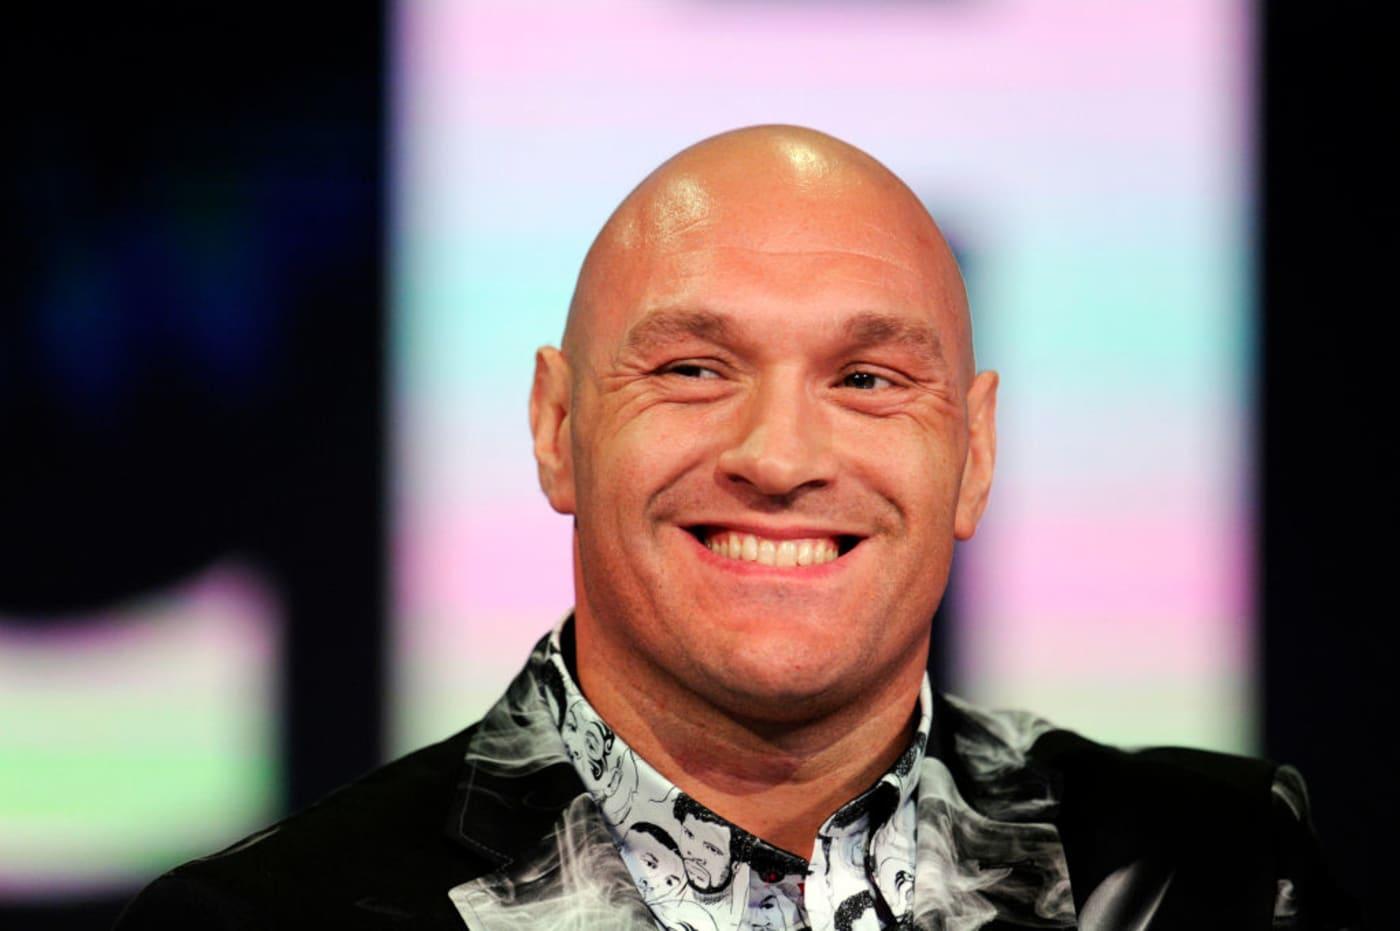 Tyson Fury Smile London 2019 Getty